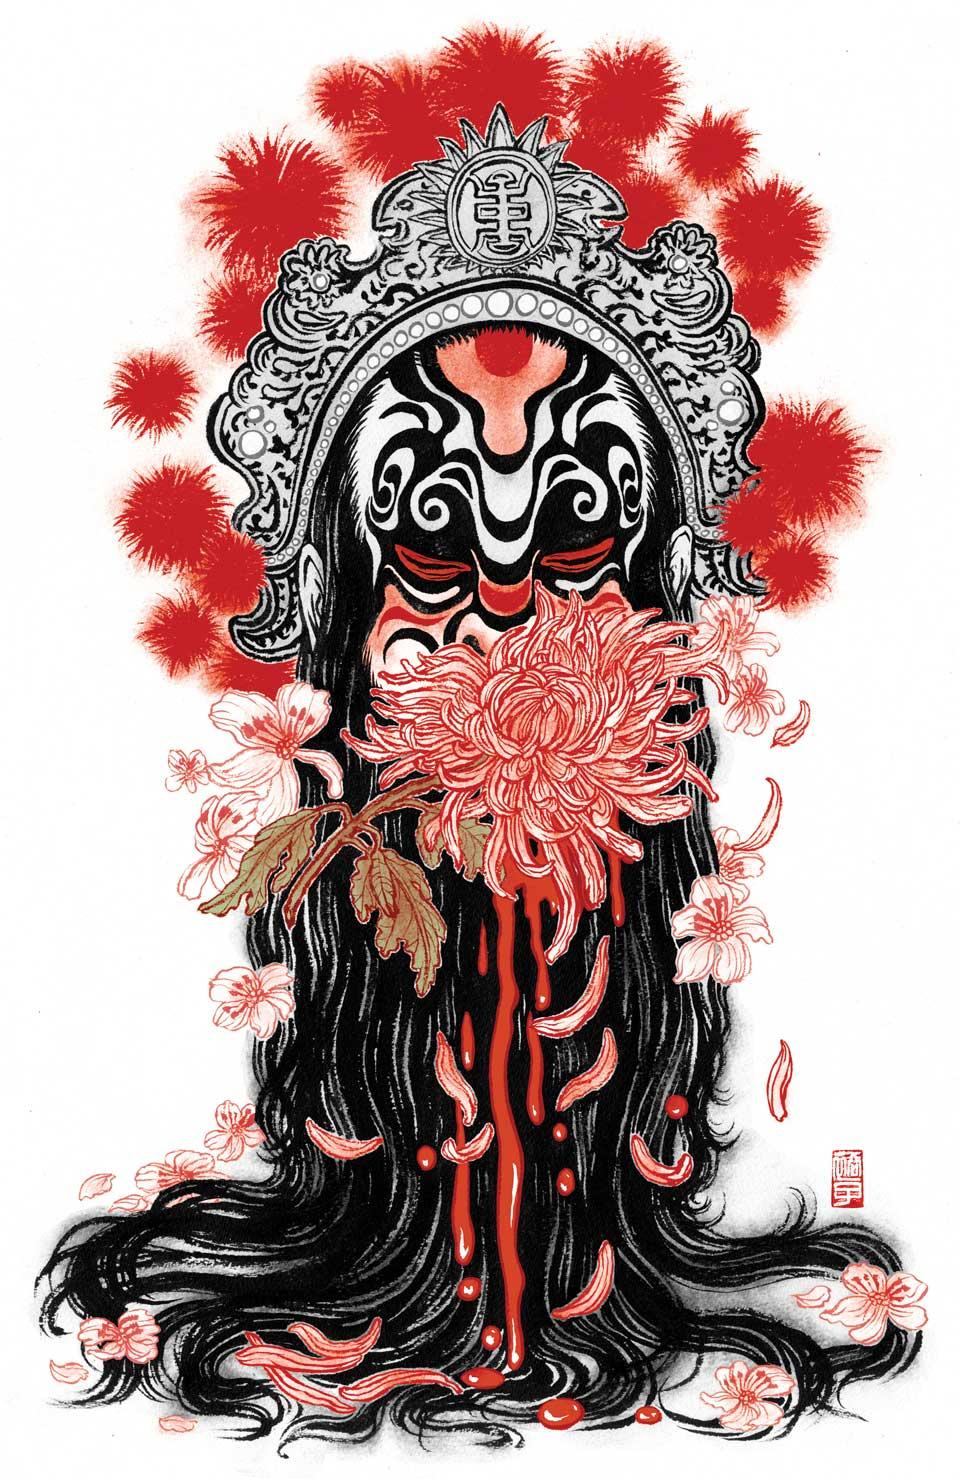 https://i0.wp.com/yukoart.com/wp-content/uploads/2013/02/sandalwood_death_mo_yan.jpg